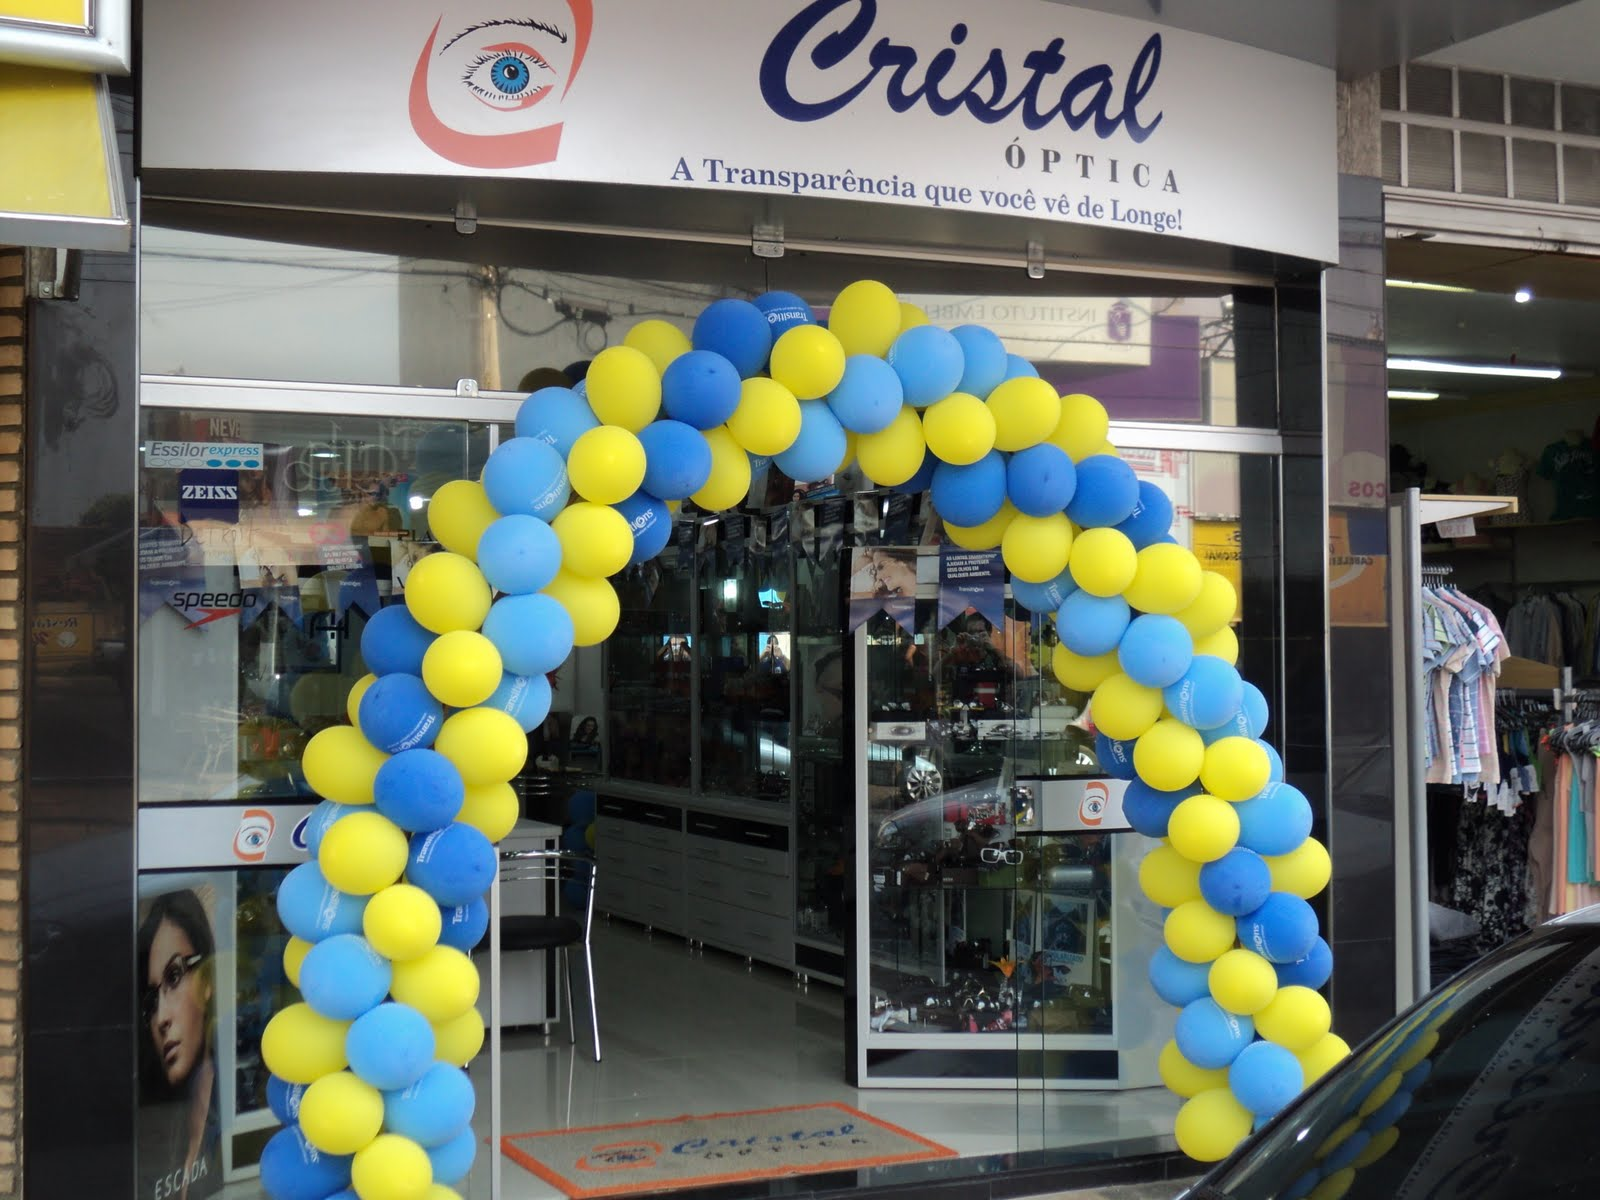 f31f3edbfbdce Dia Transitions Santa Fé - Ótica Cristal do Sul   Paulo Transitions